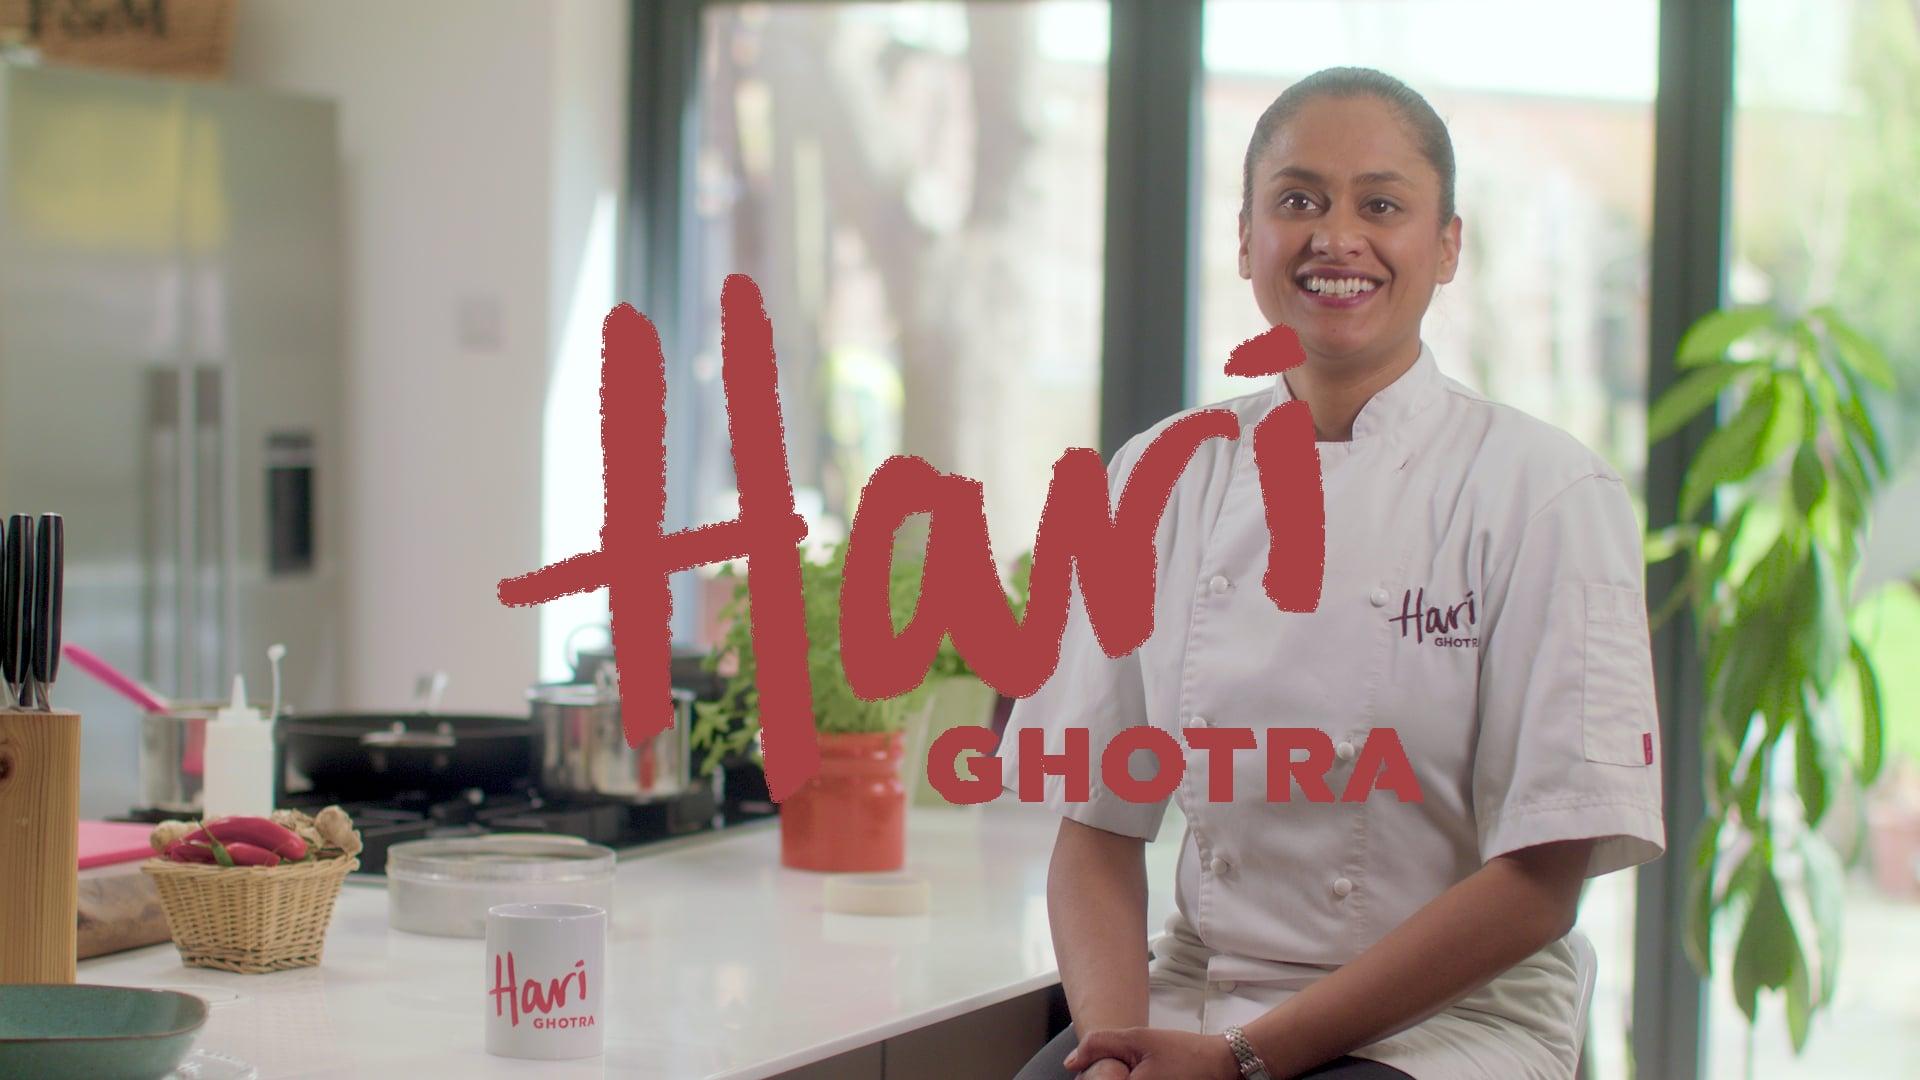 Hari Ghotra - Off The Block